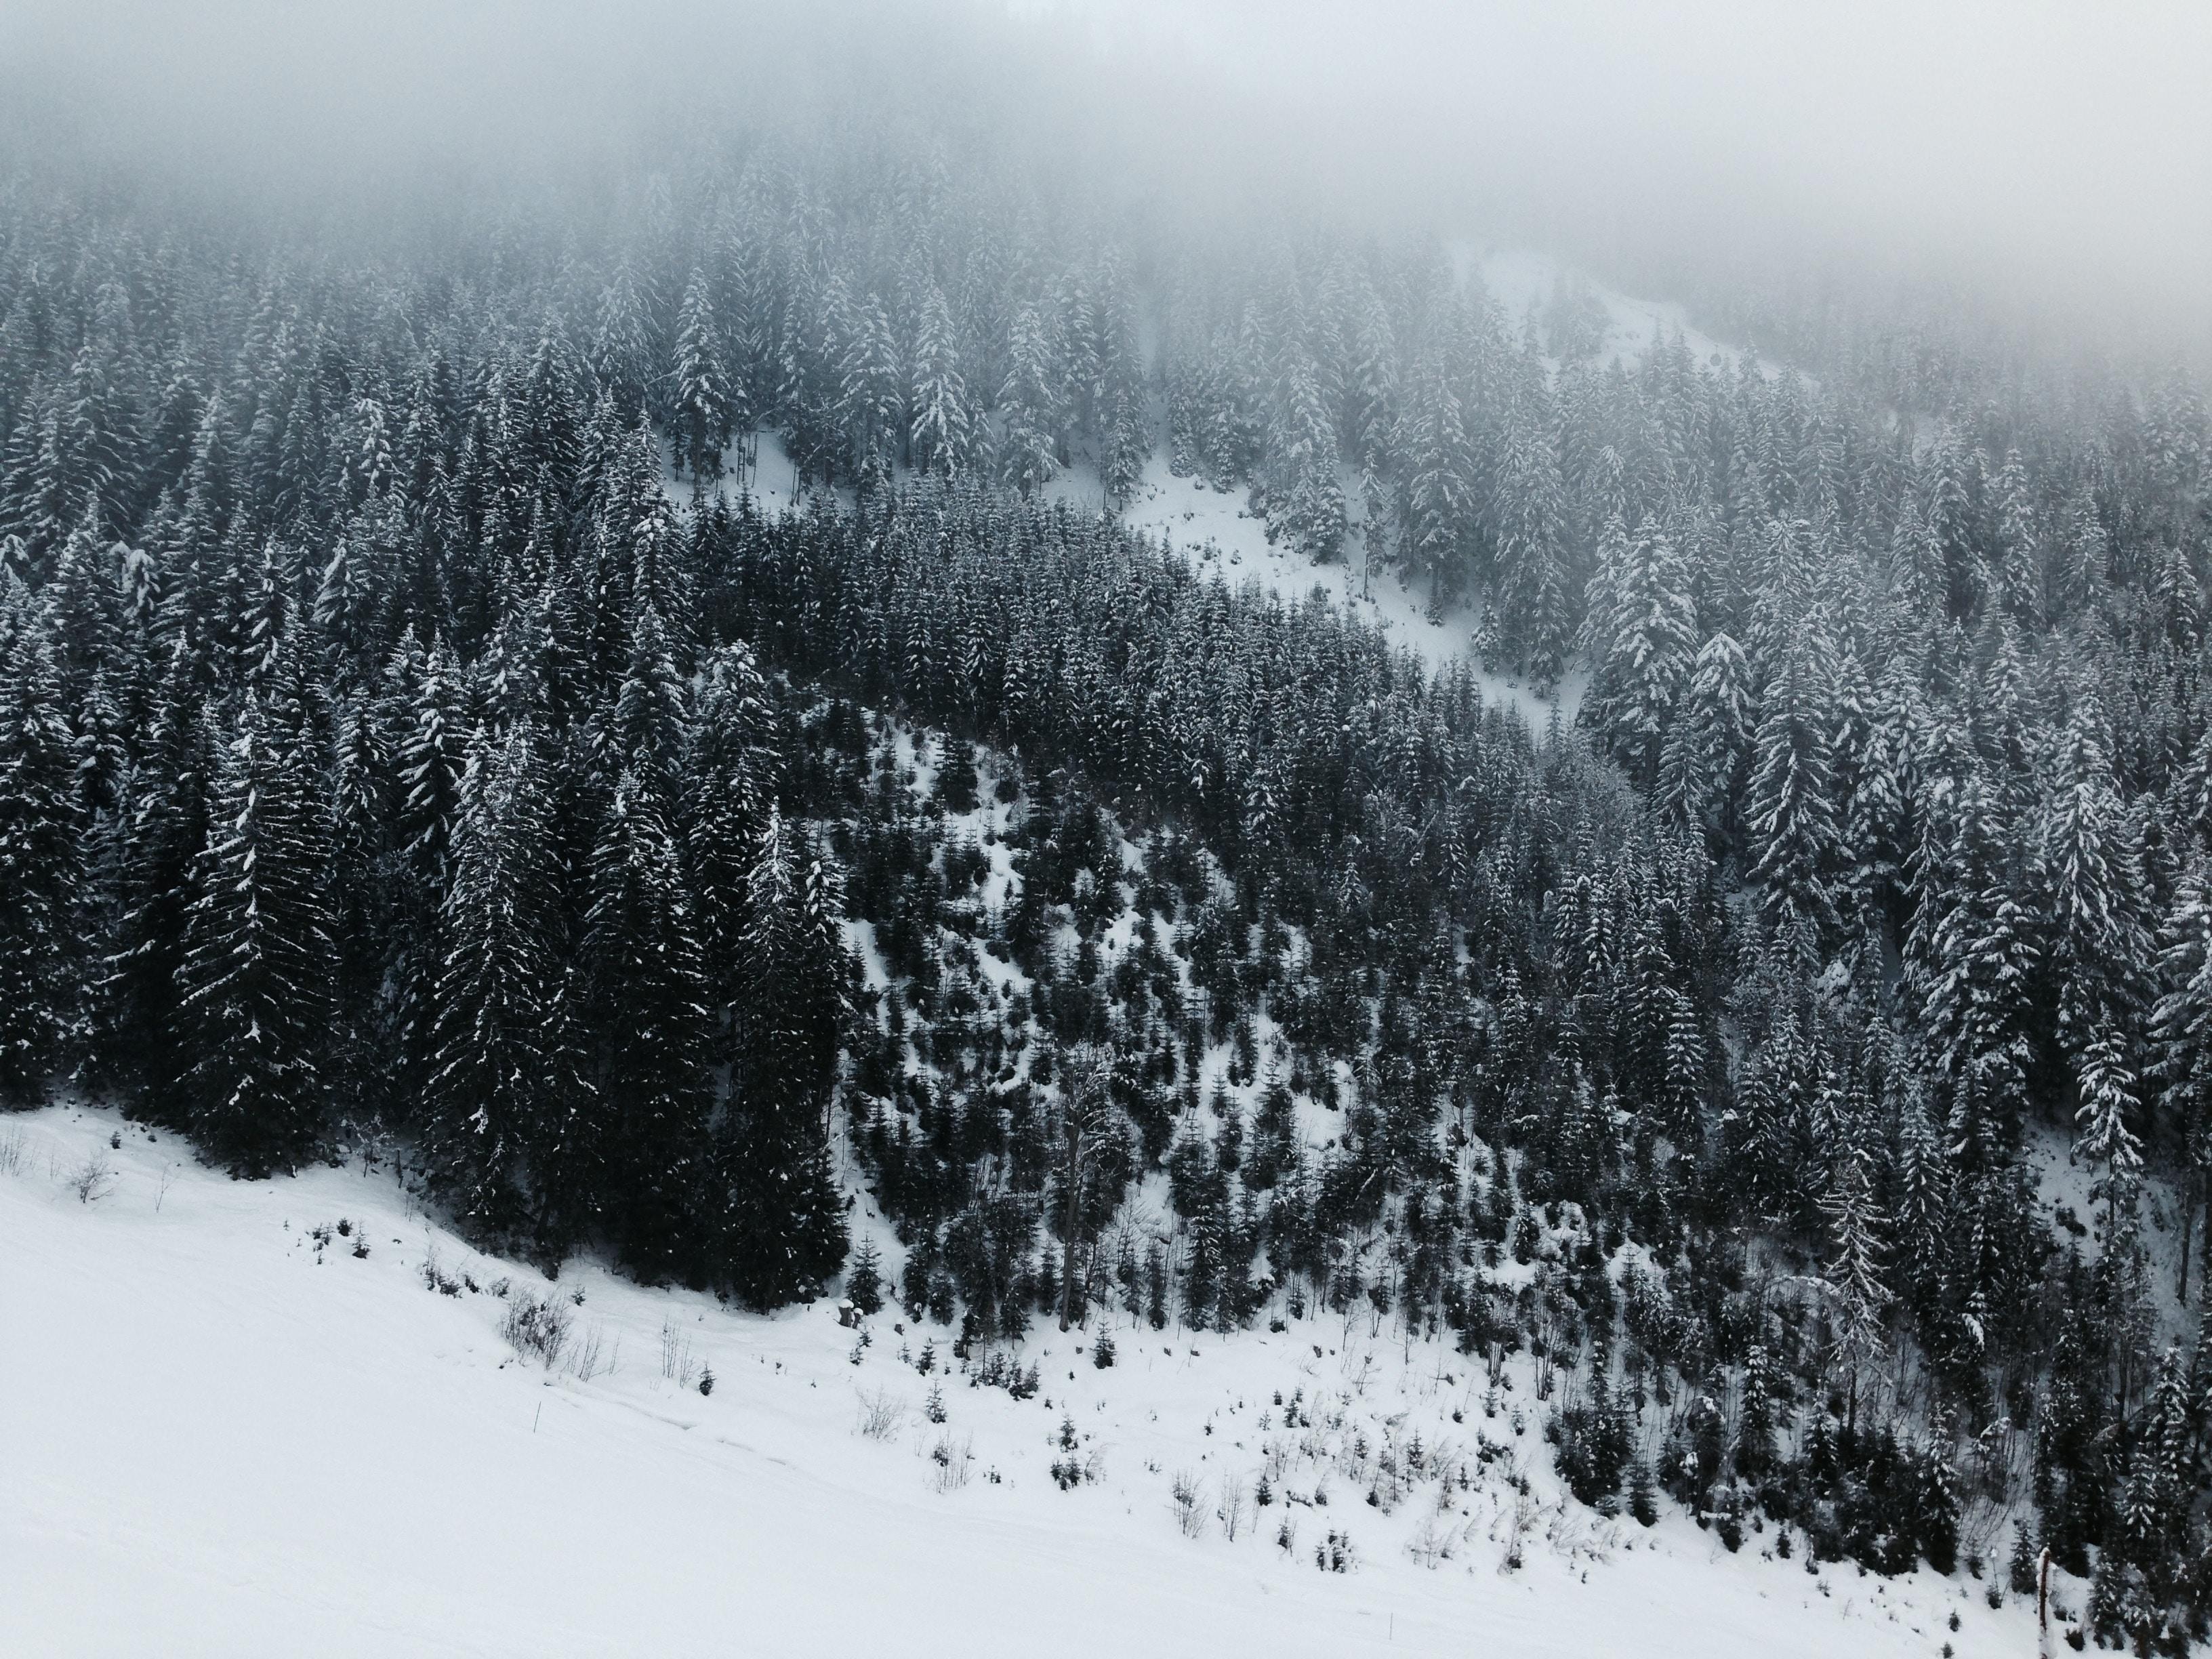 bird's eye view photography of pine trees